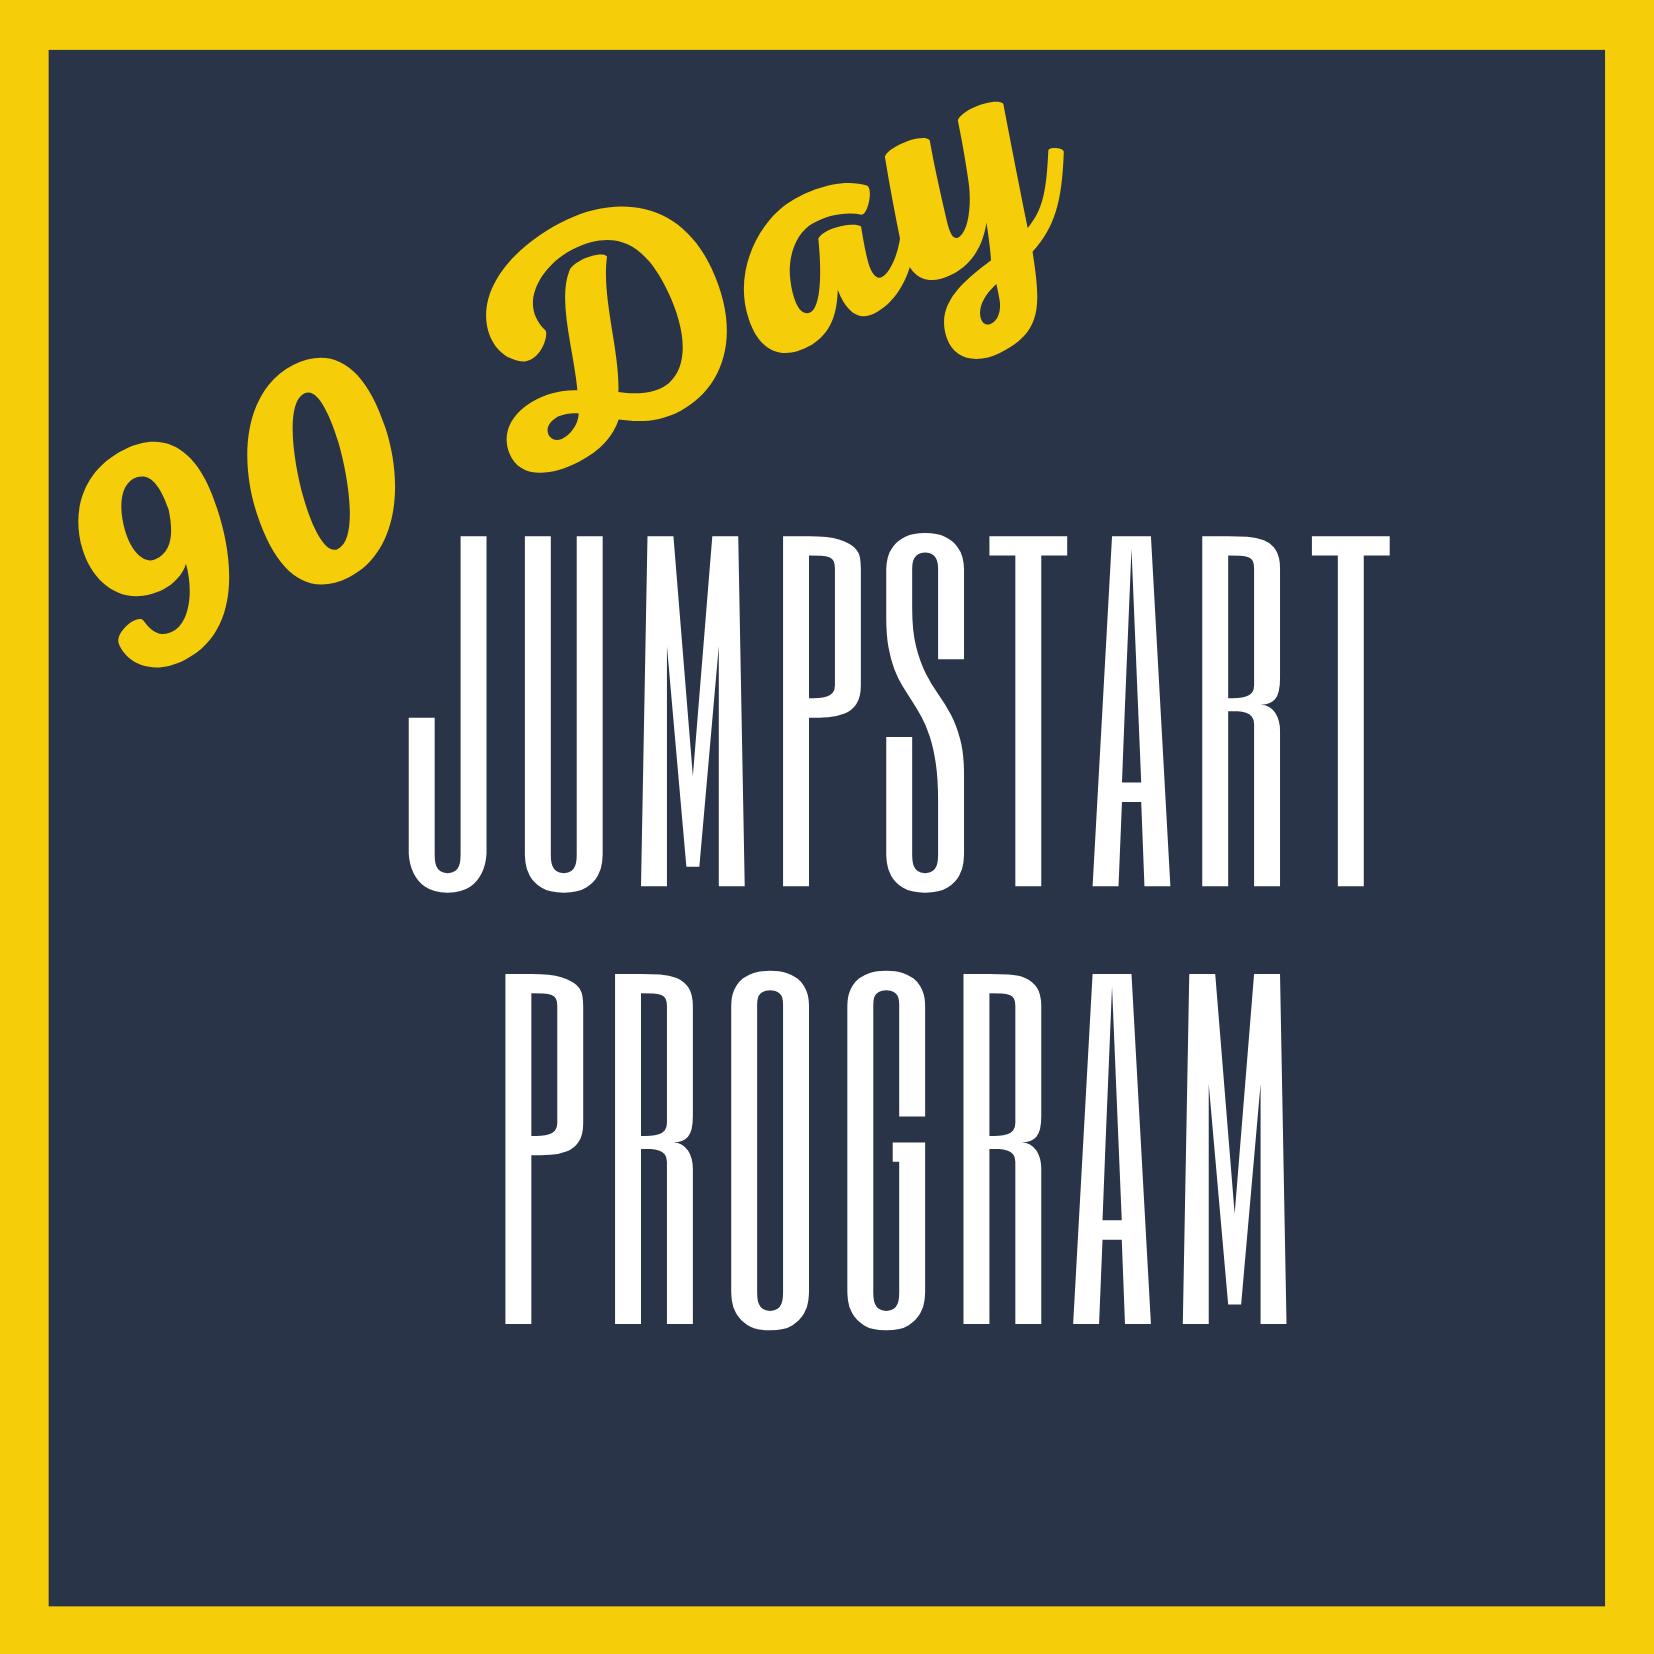 90 Day JumpStart Program